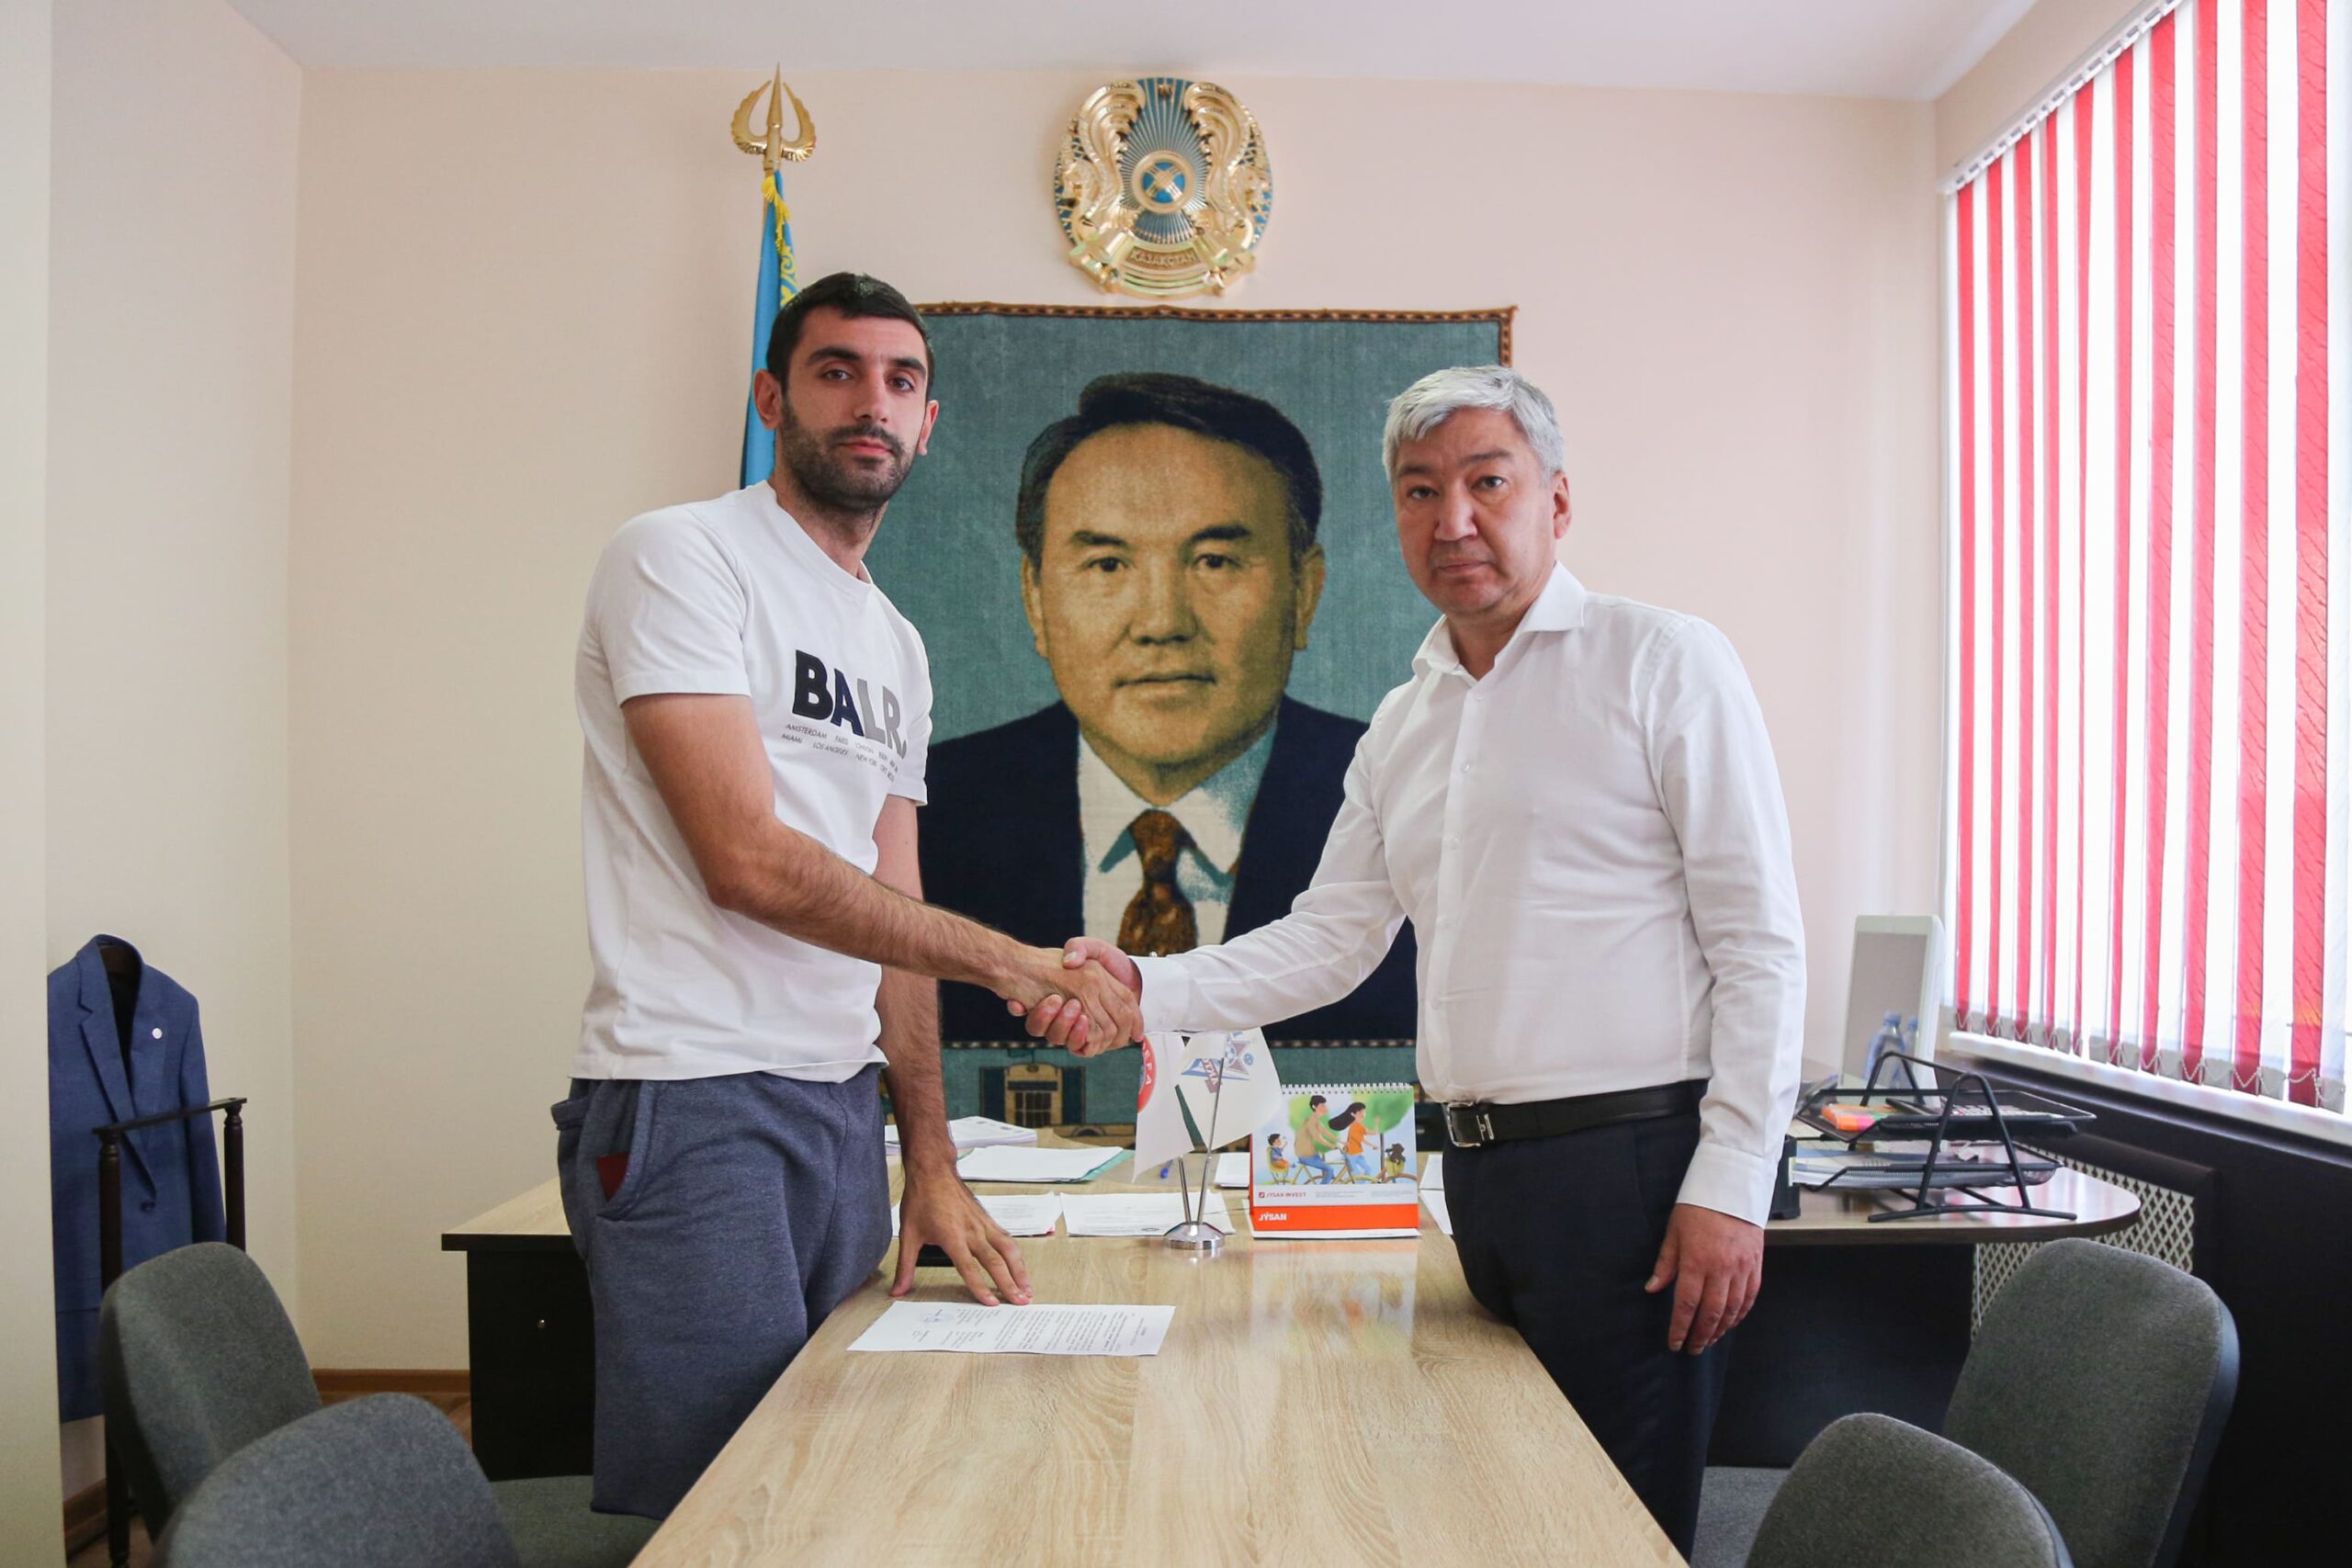 ФК «Актобе» и Армен Манучарян расторгли контракт по обоюдному согласию сторон.